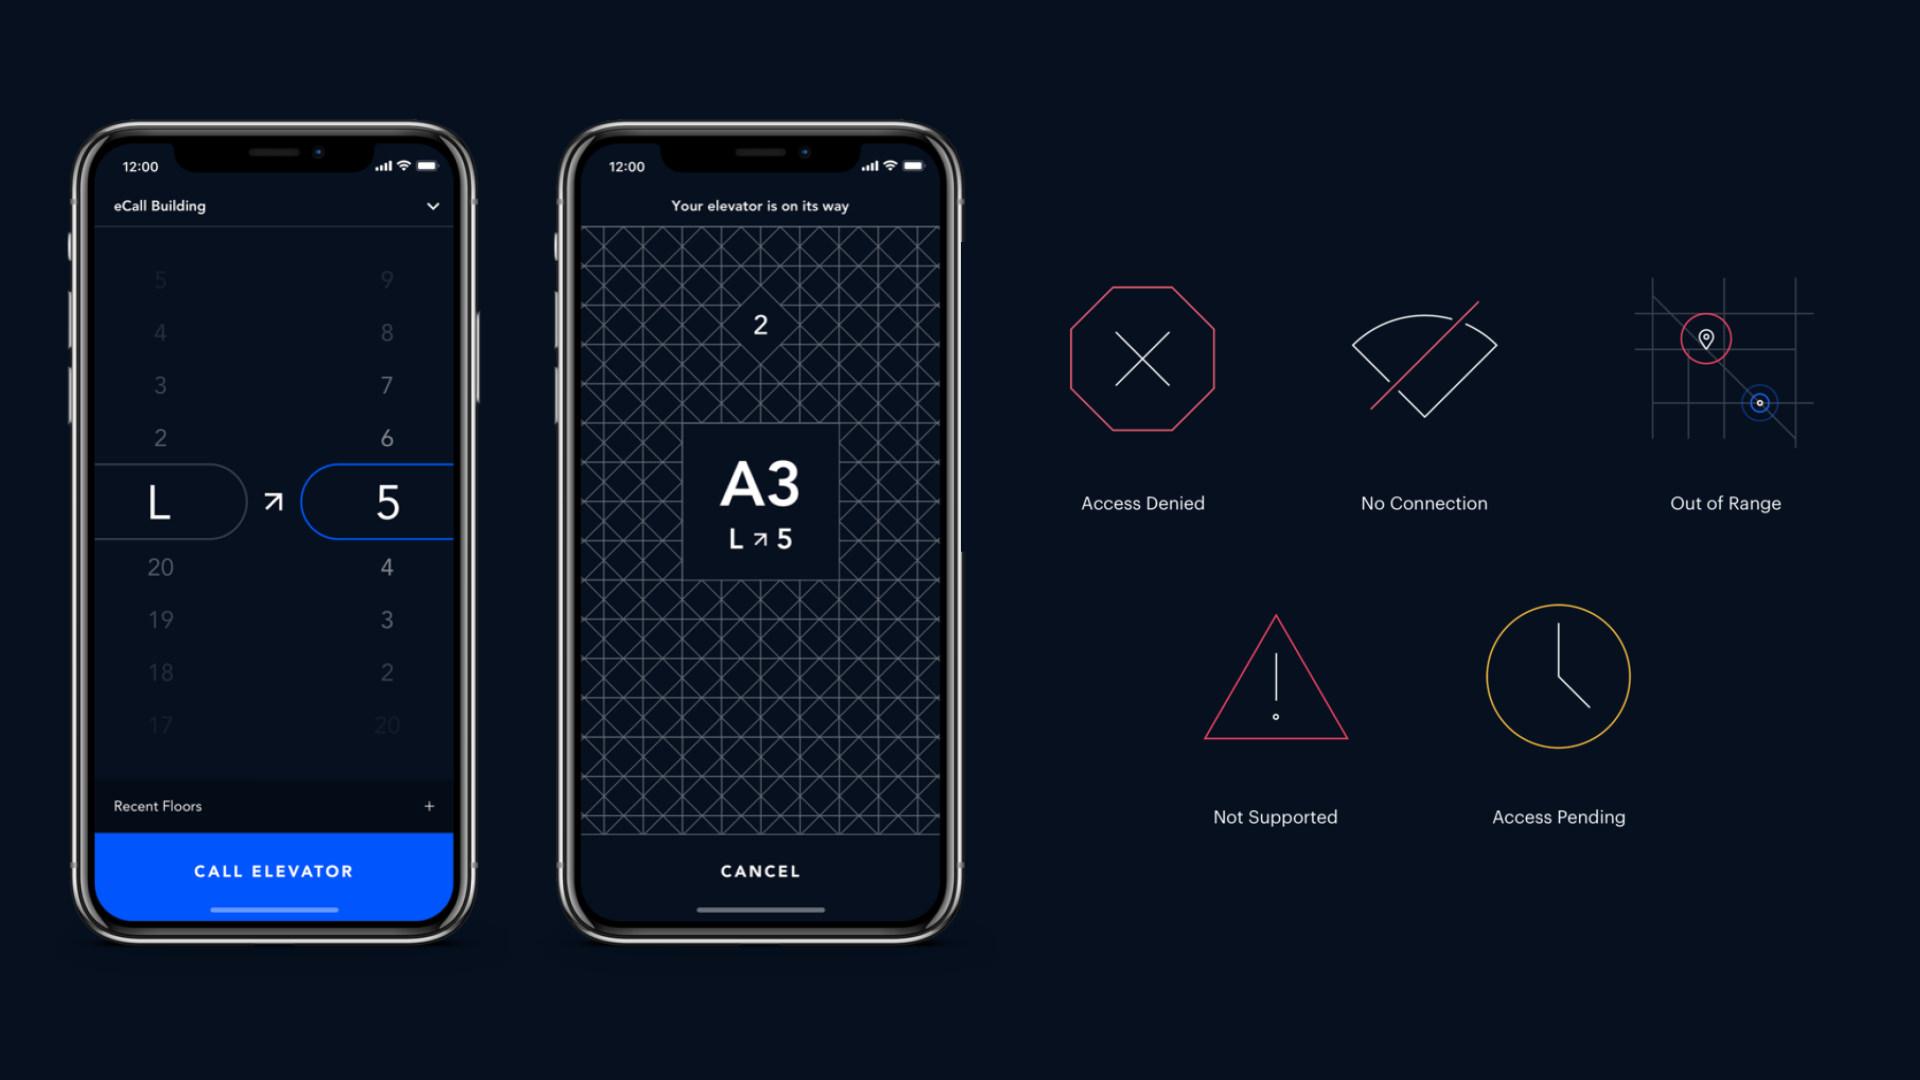 OTIS eCall Elevator App